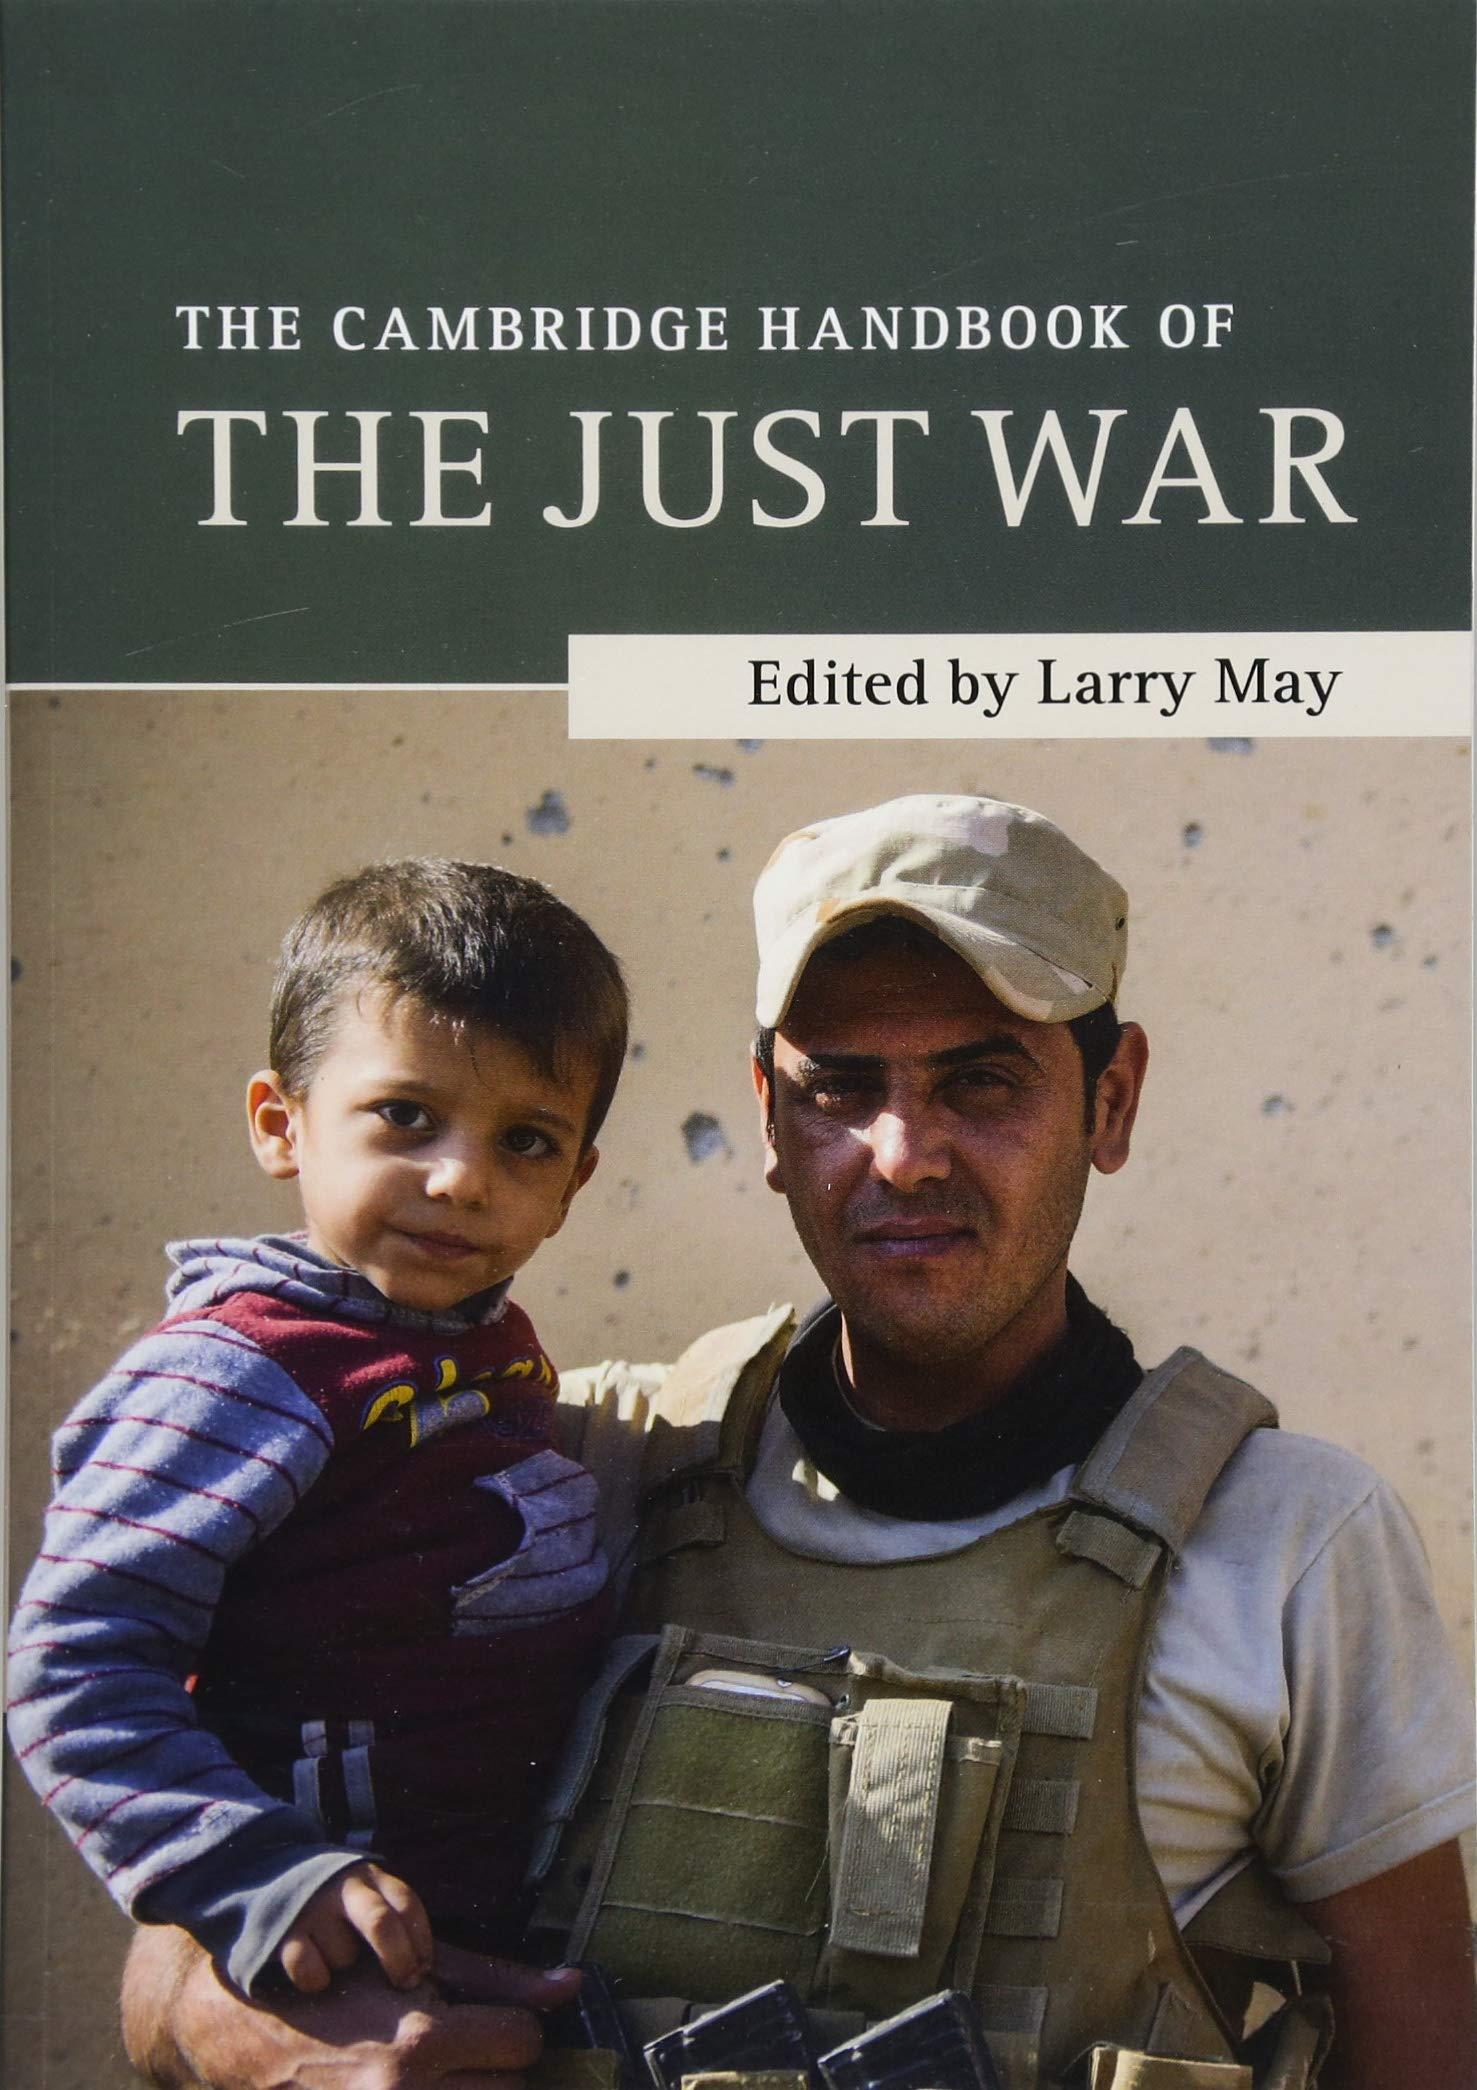 The Cambridge Handbook of the Just War (Cambridge Handbooks in Philosophy) pdf